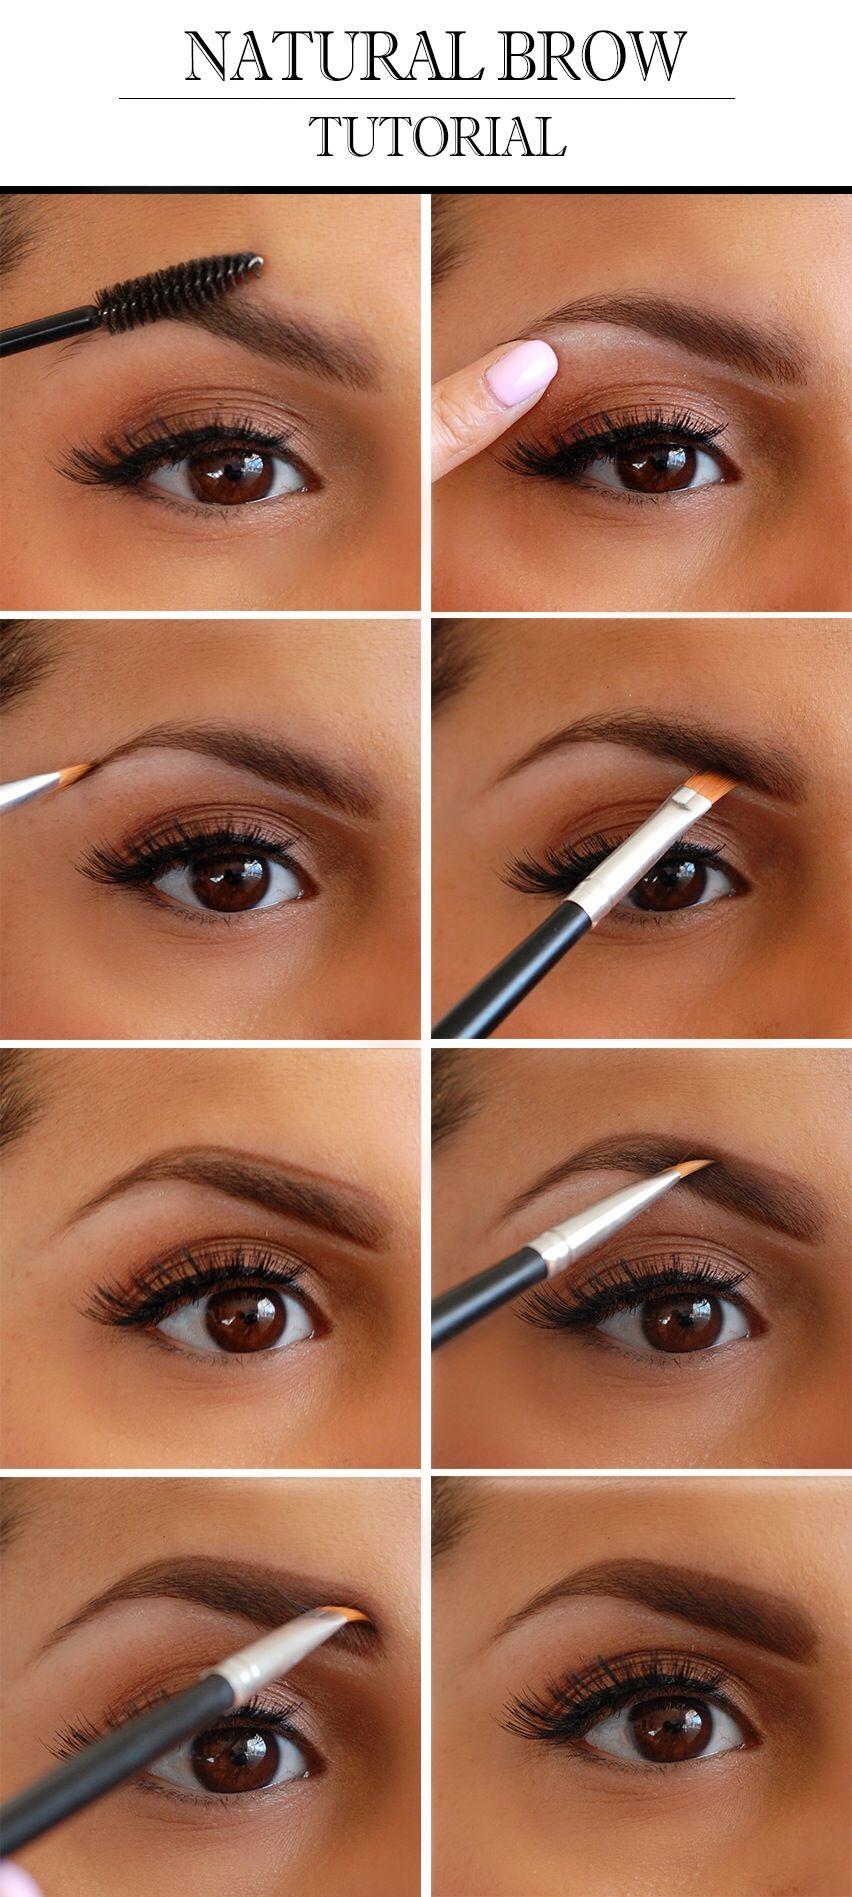 Natural Eyebrow Tutorial | Natural eyebrow tutorial ...